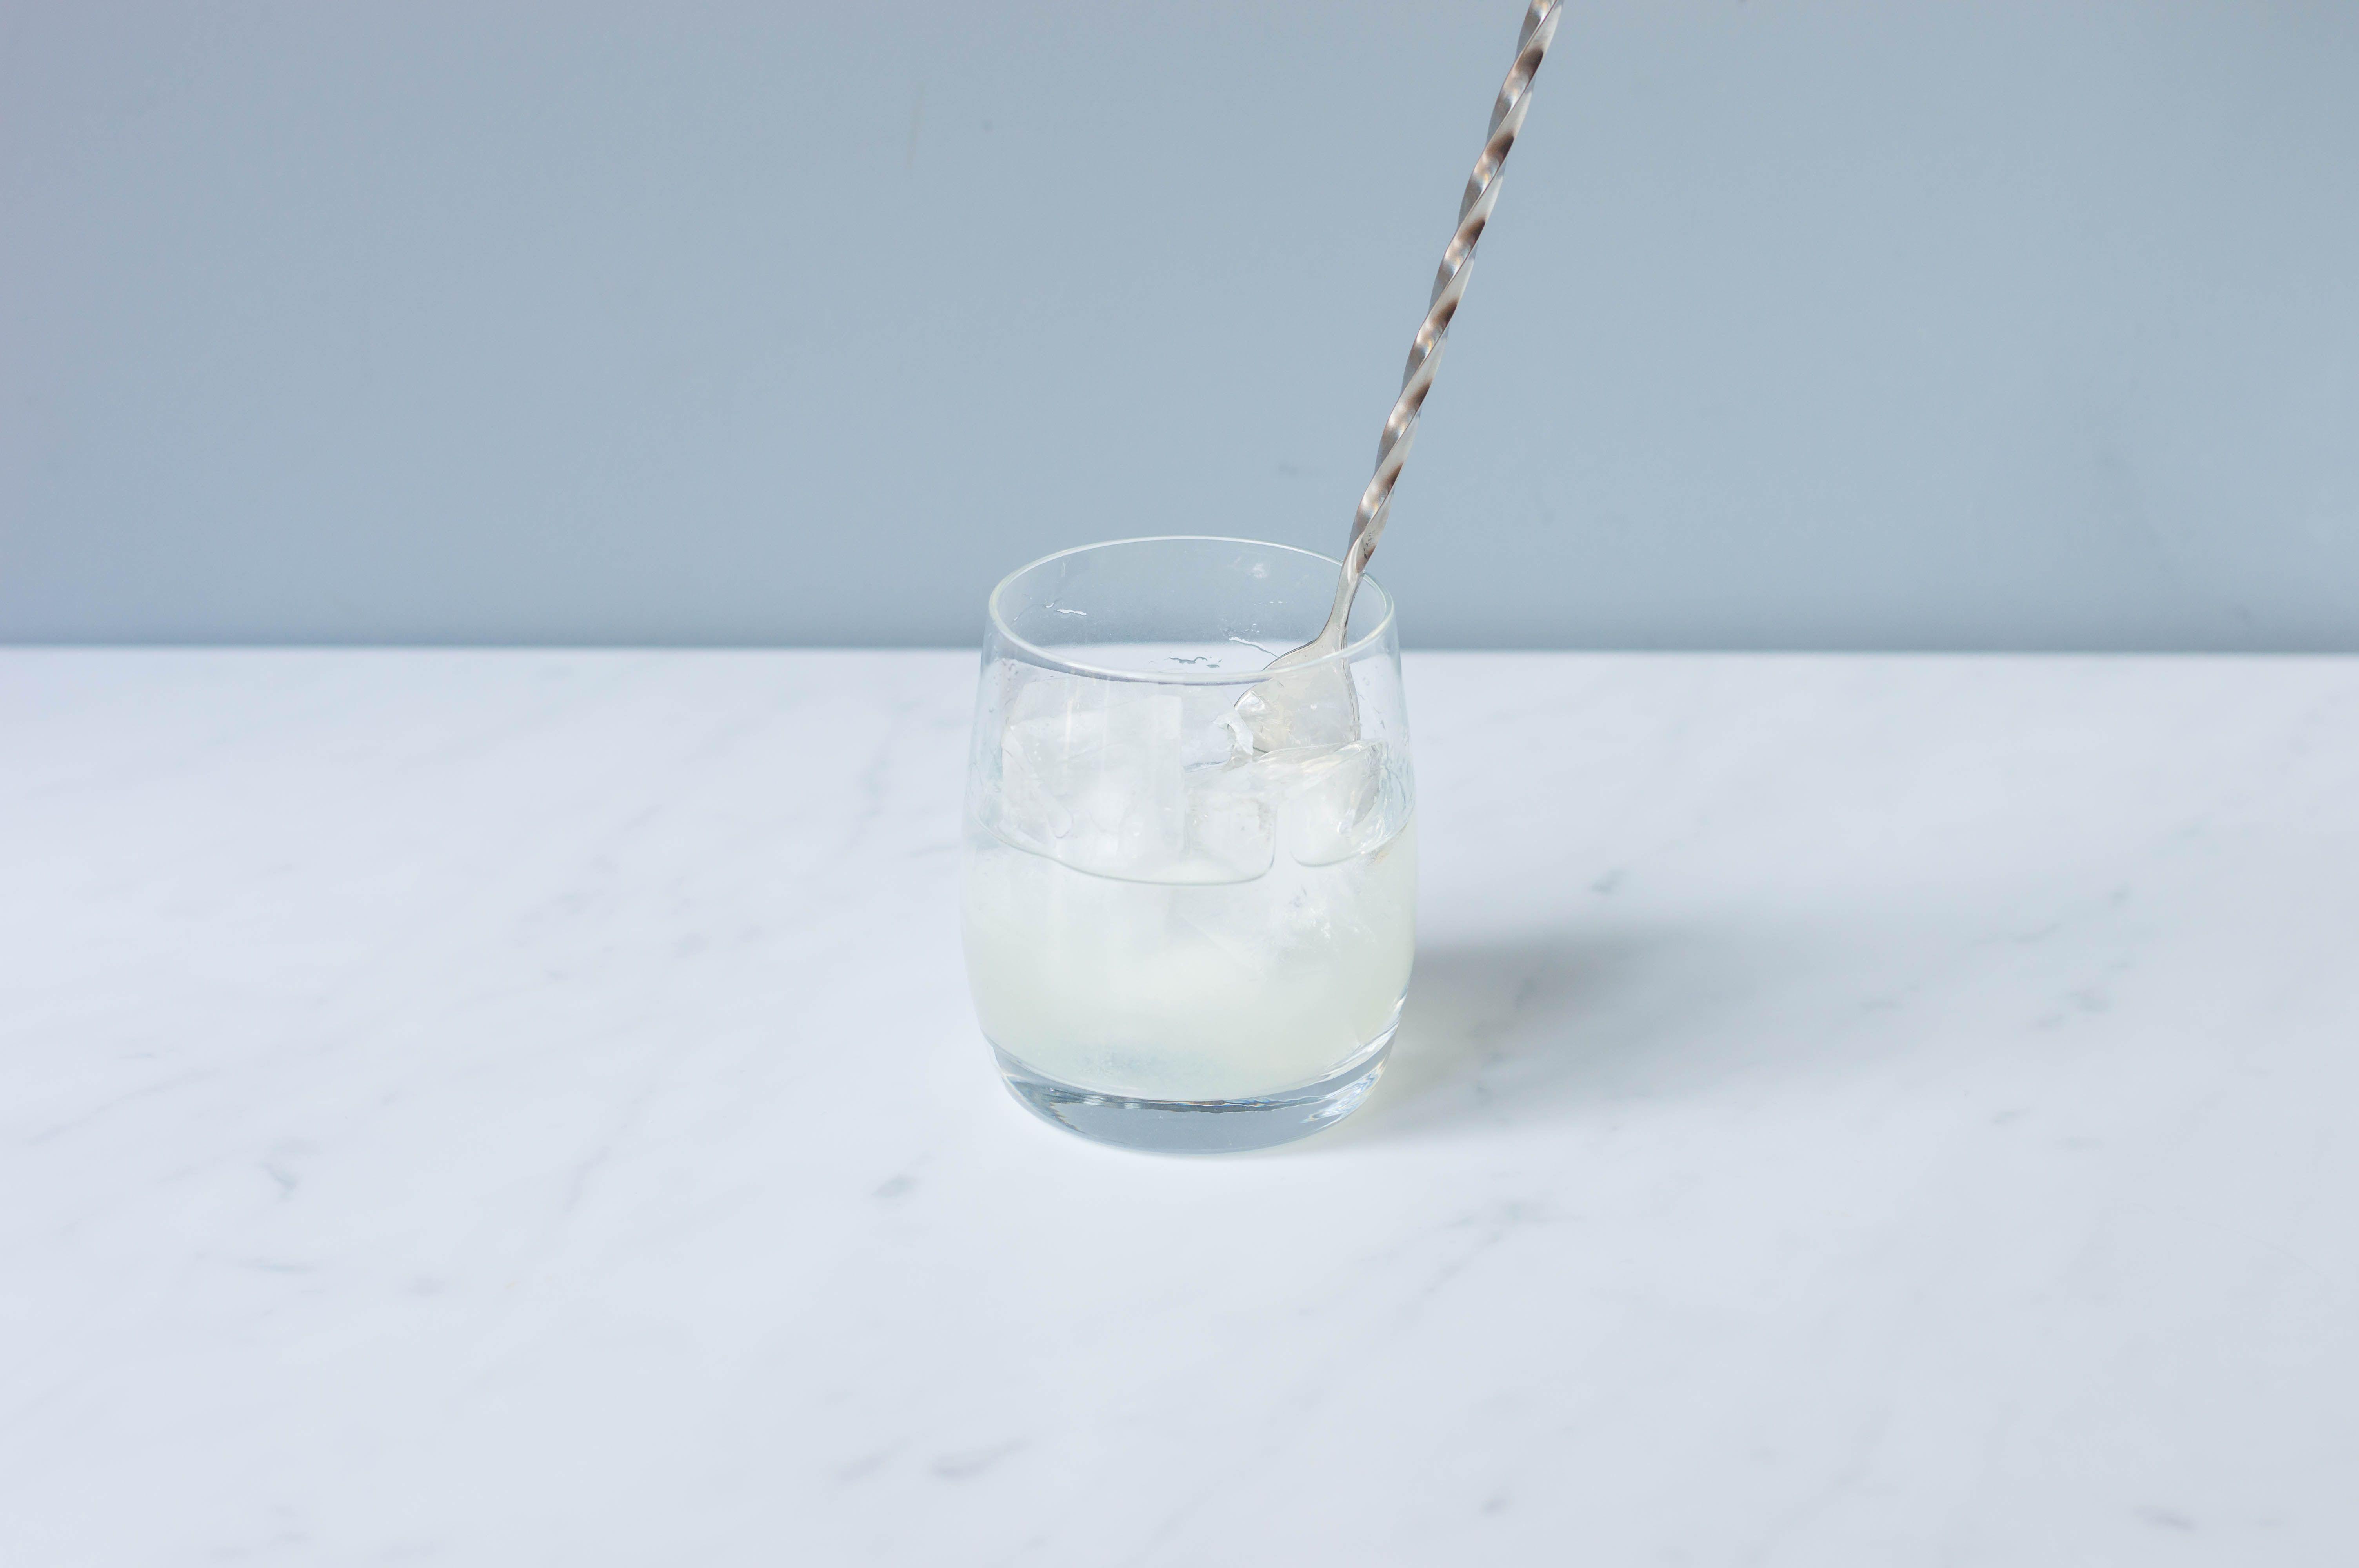 Foghorn cocktail is stirred